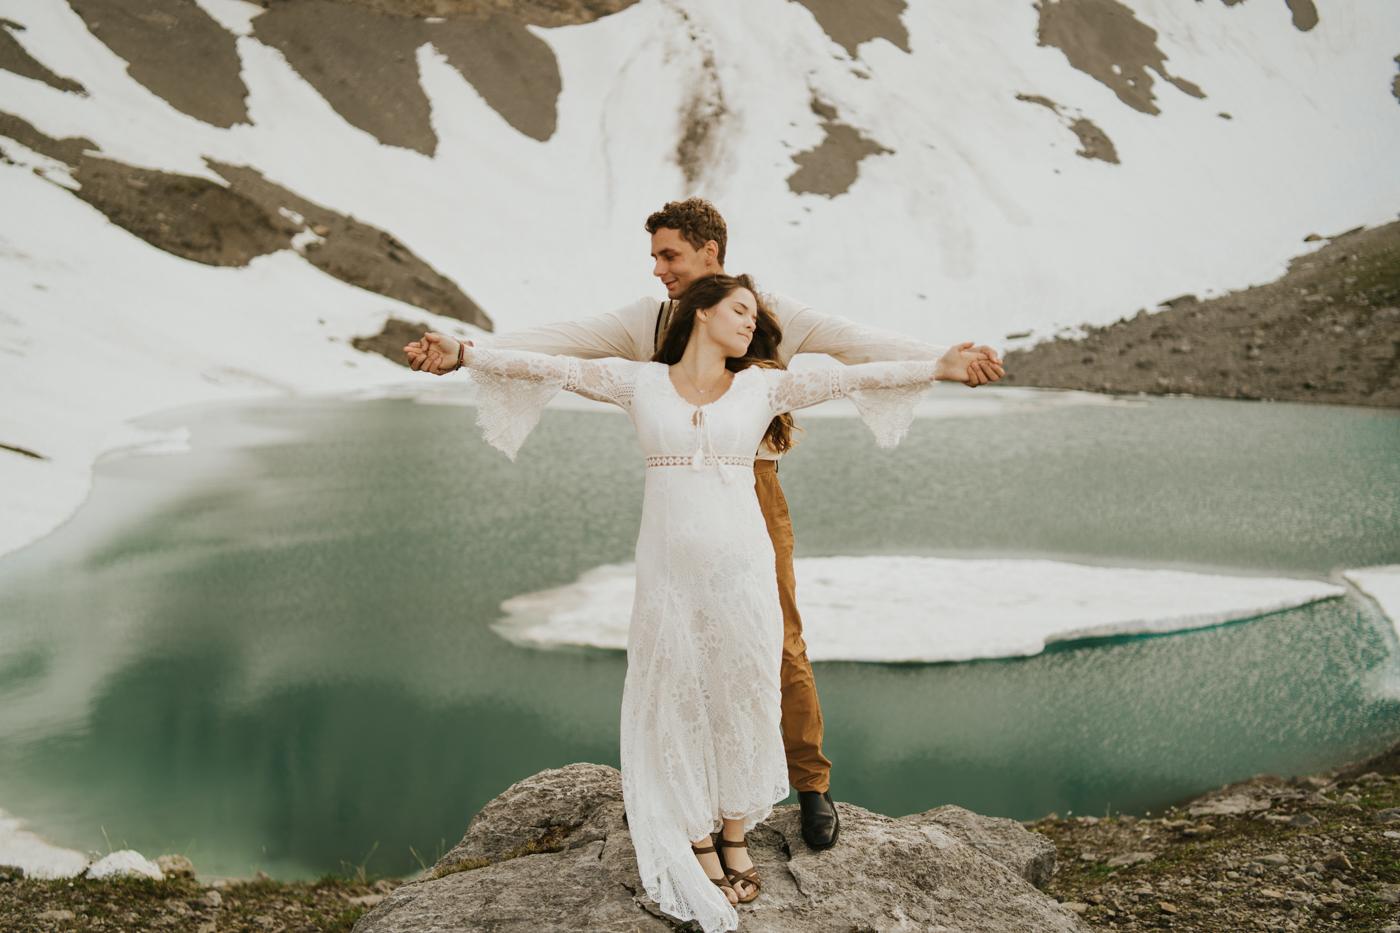 tyraephotography_photographer_wedding_elopement_engagement_photography-07665.jpg